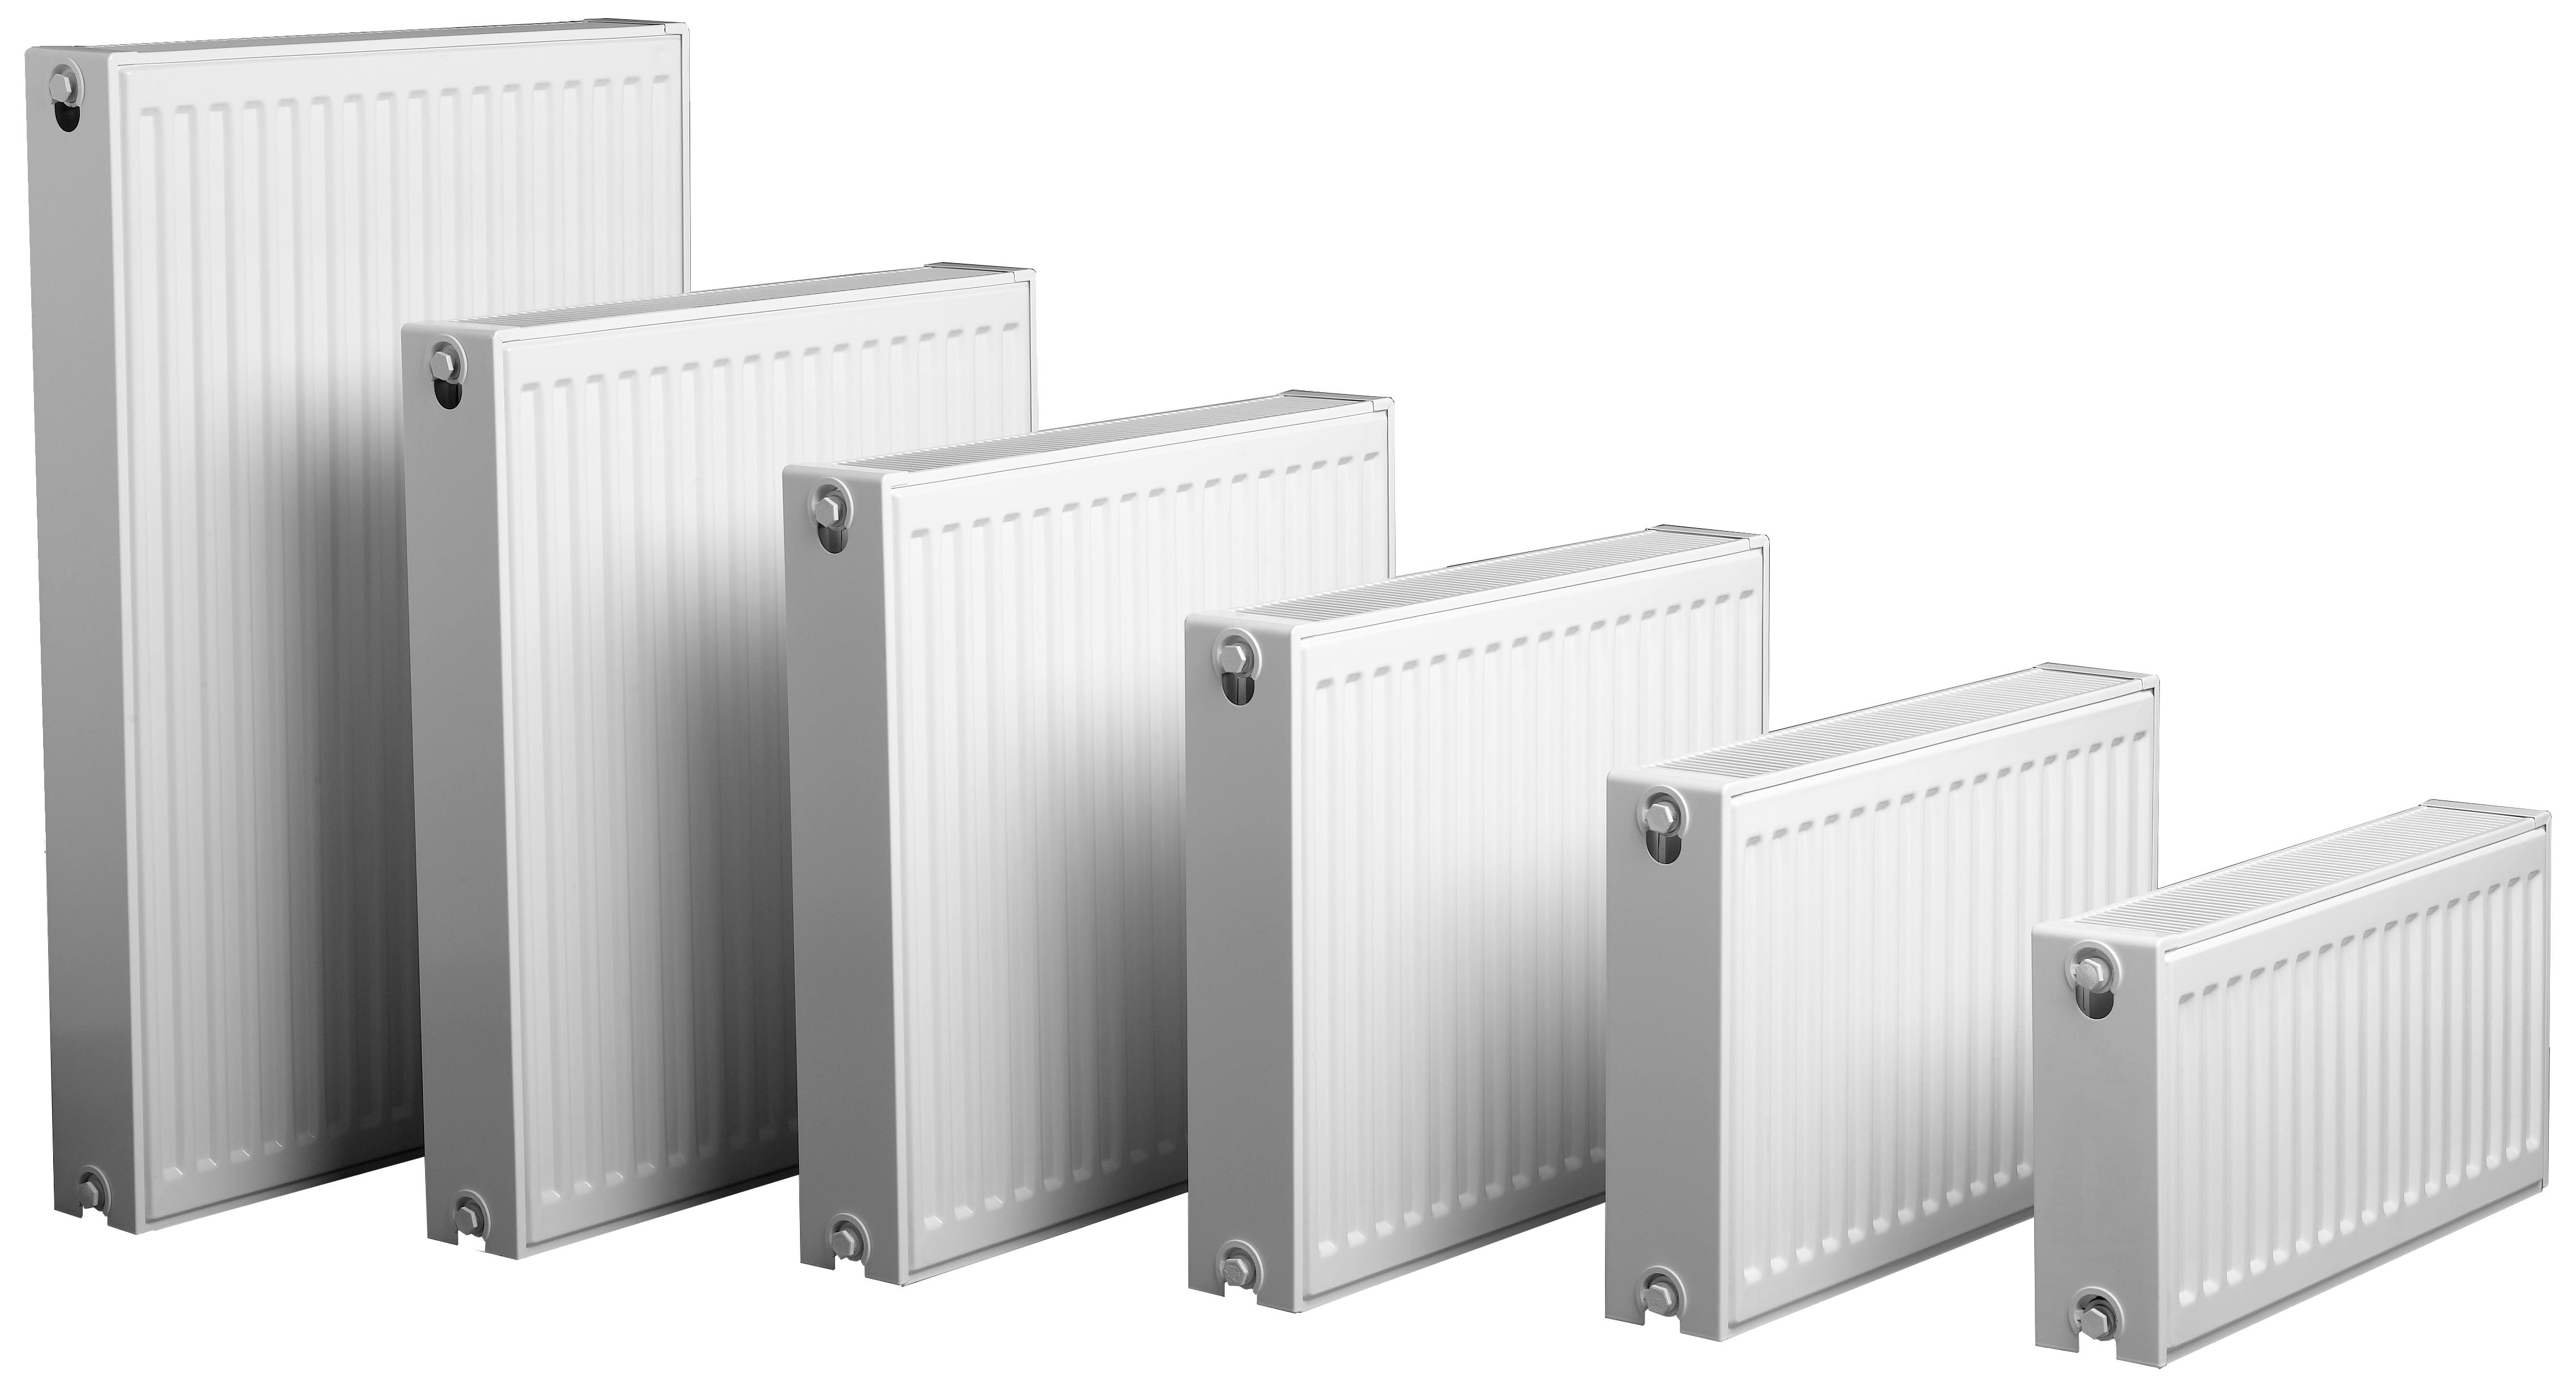 Standarta radiators 22 klasse, standarta radiators majai, radiators klasiskais